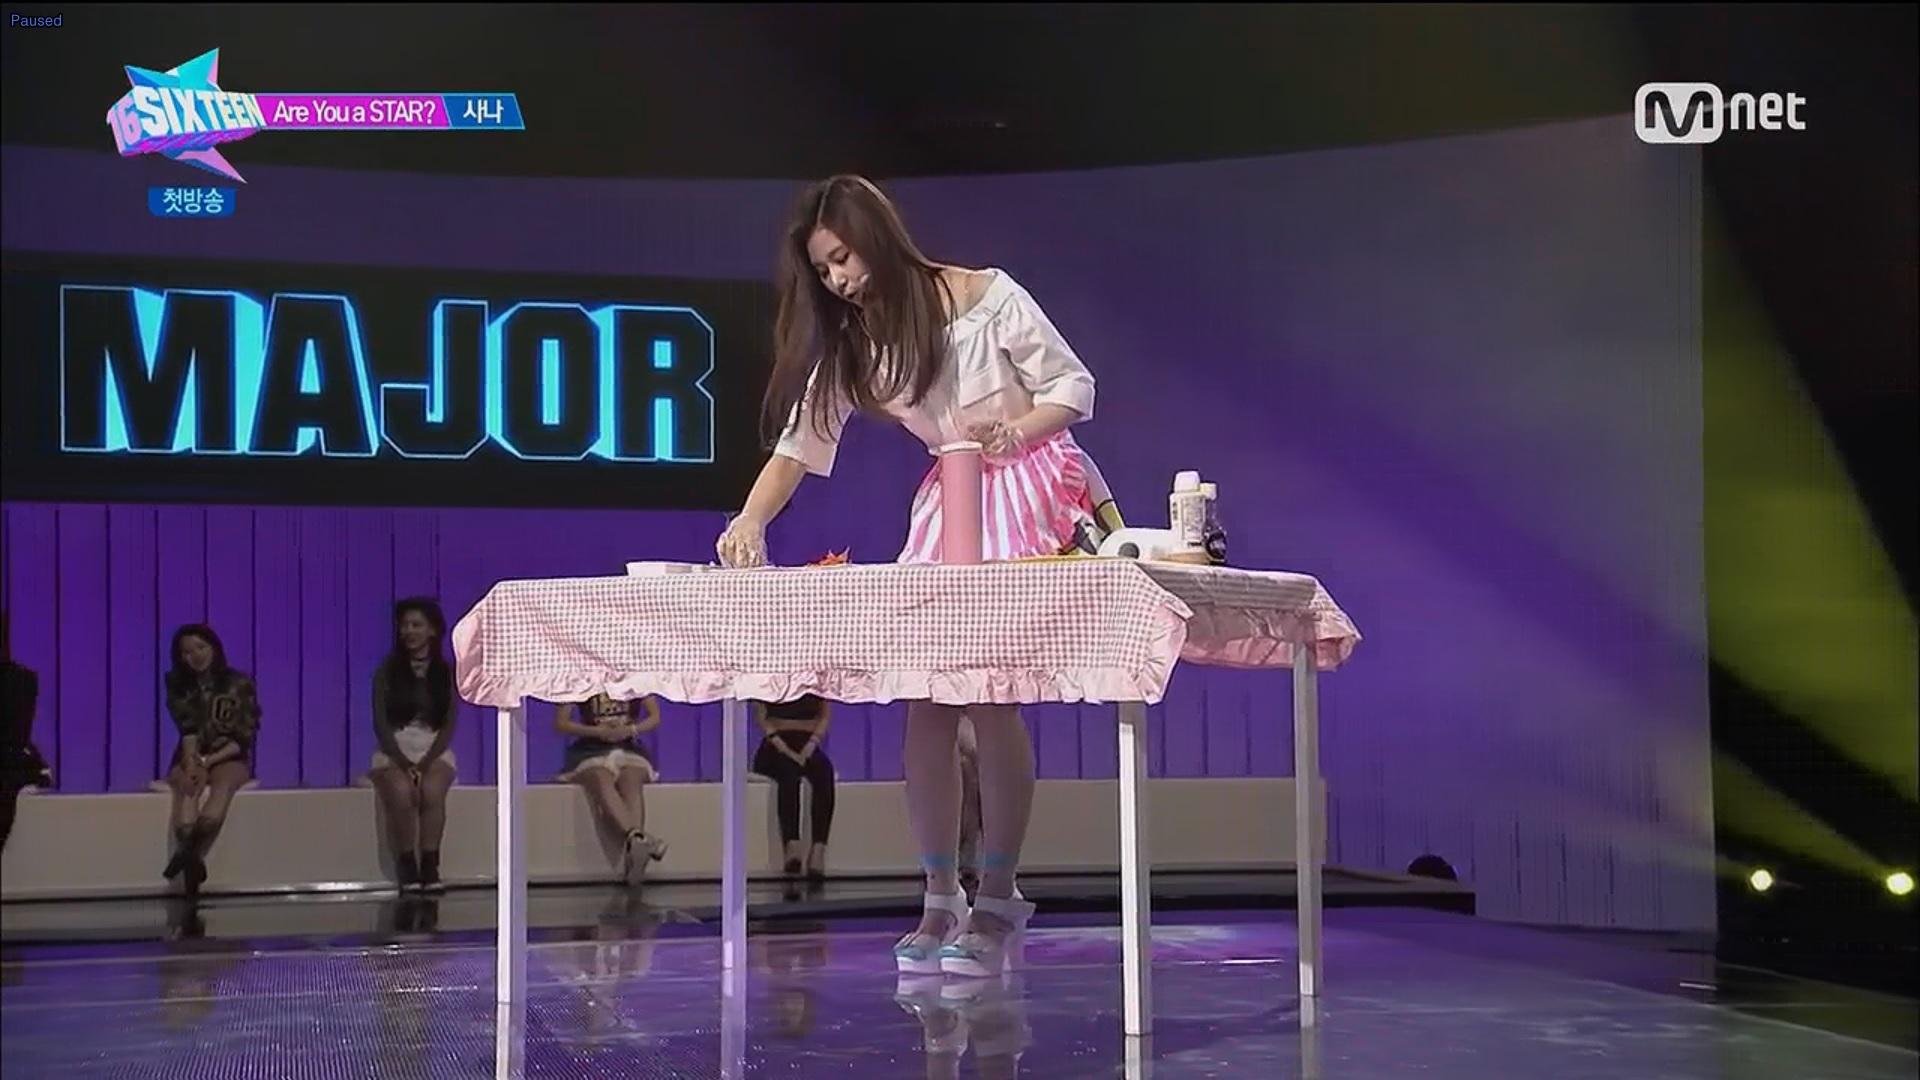 Sana prepares spring rolls for JYP on stage